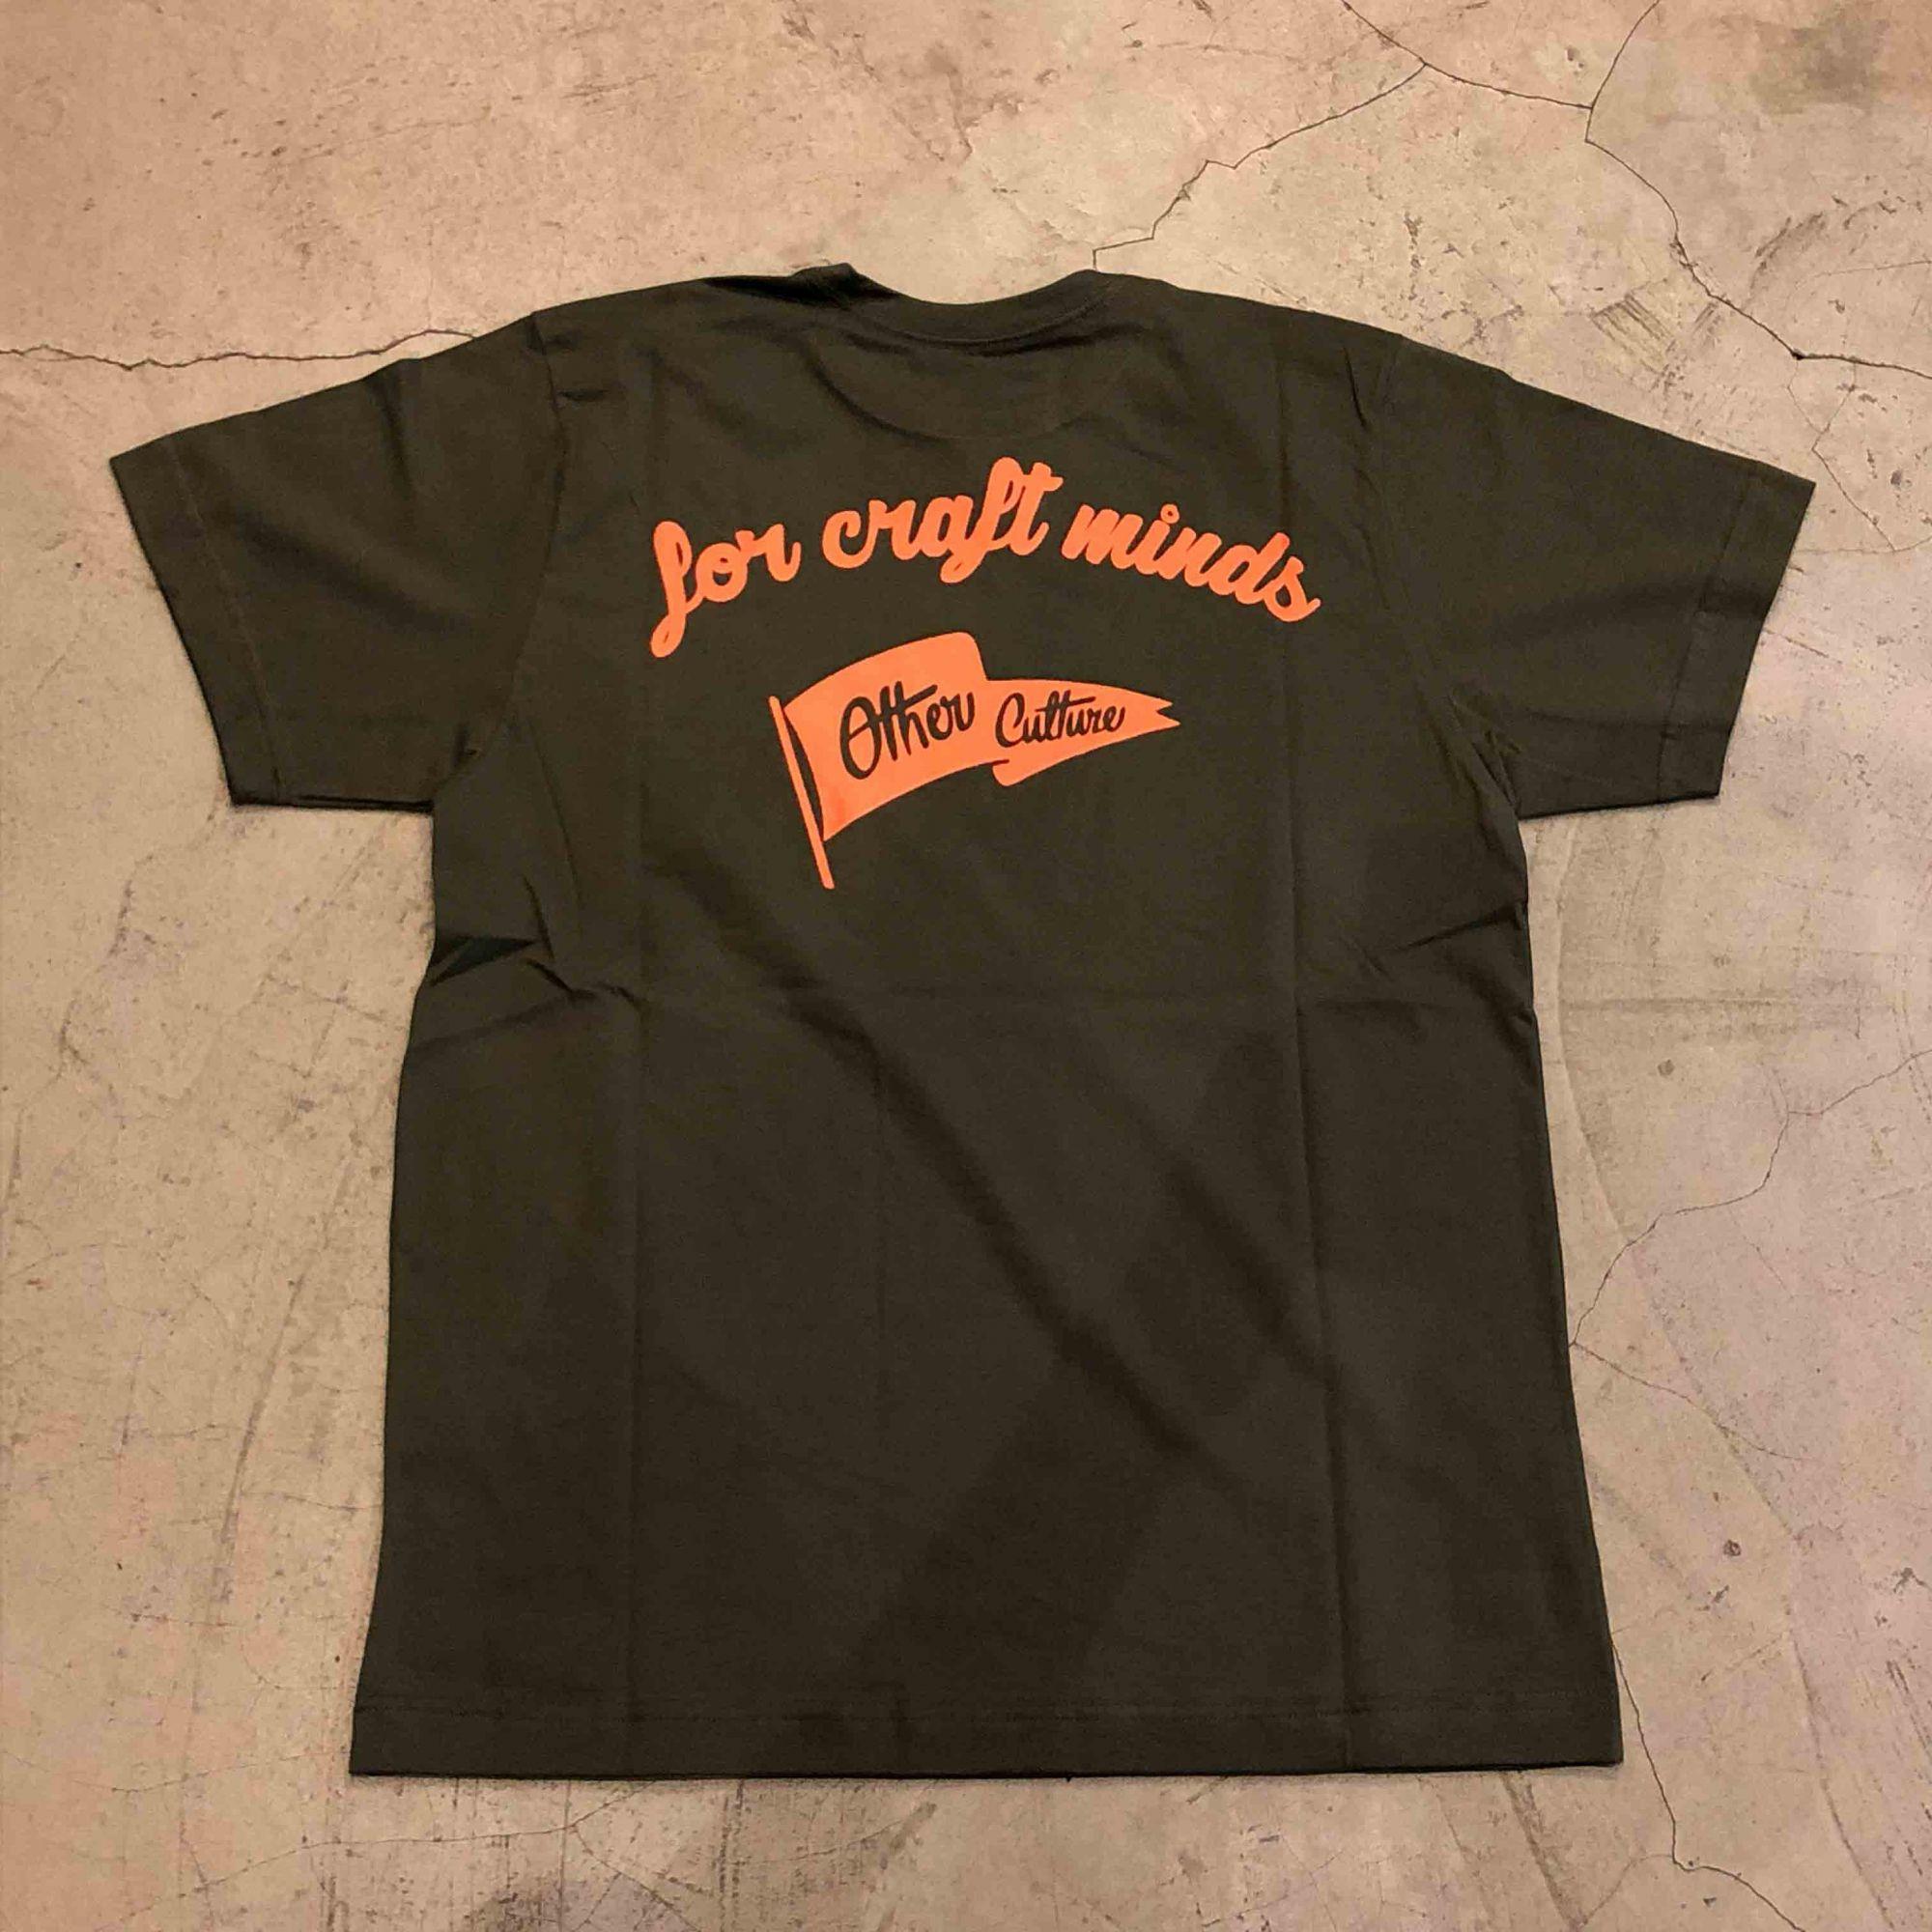 "Camiseta Other Culture "" For Craft Minds "" Verde"